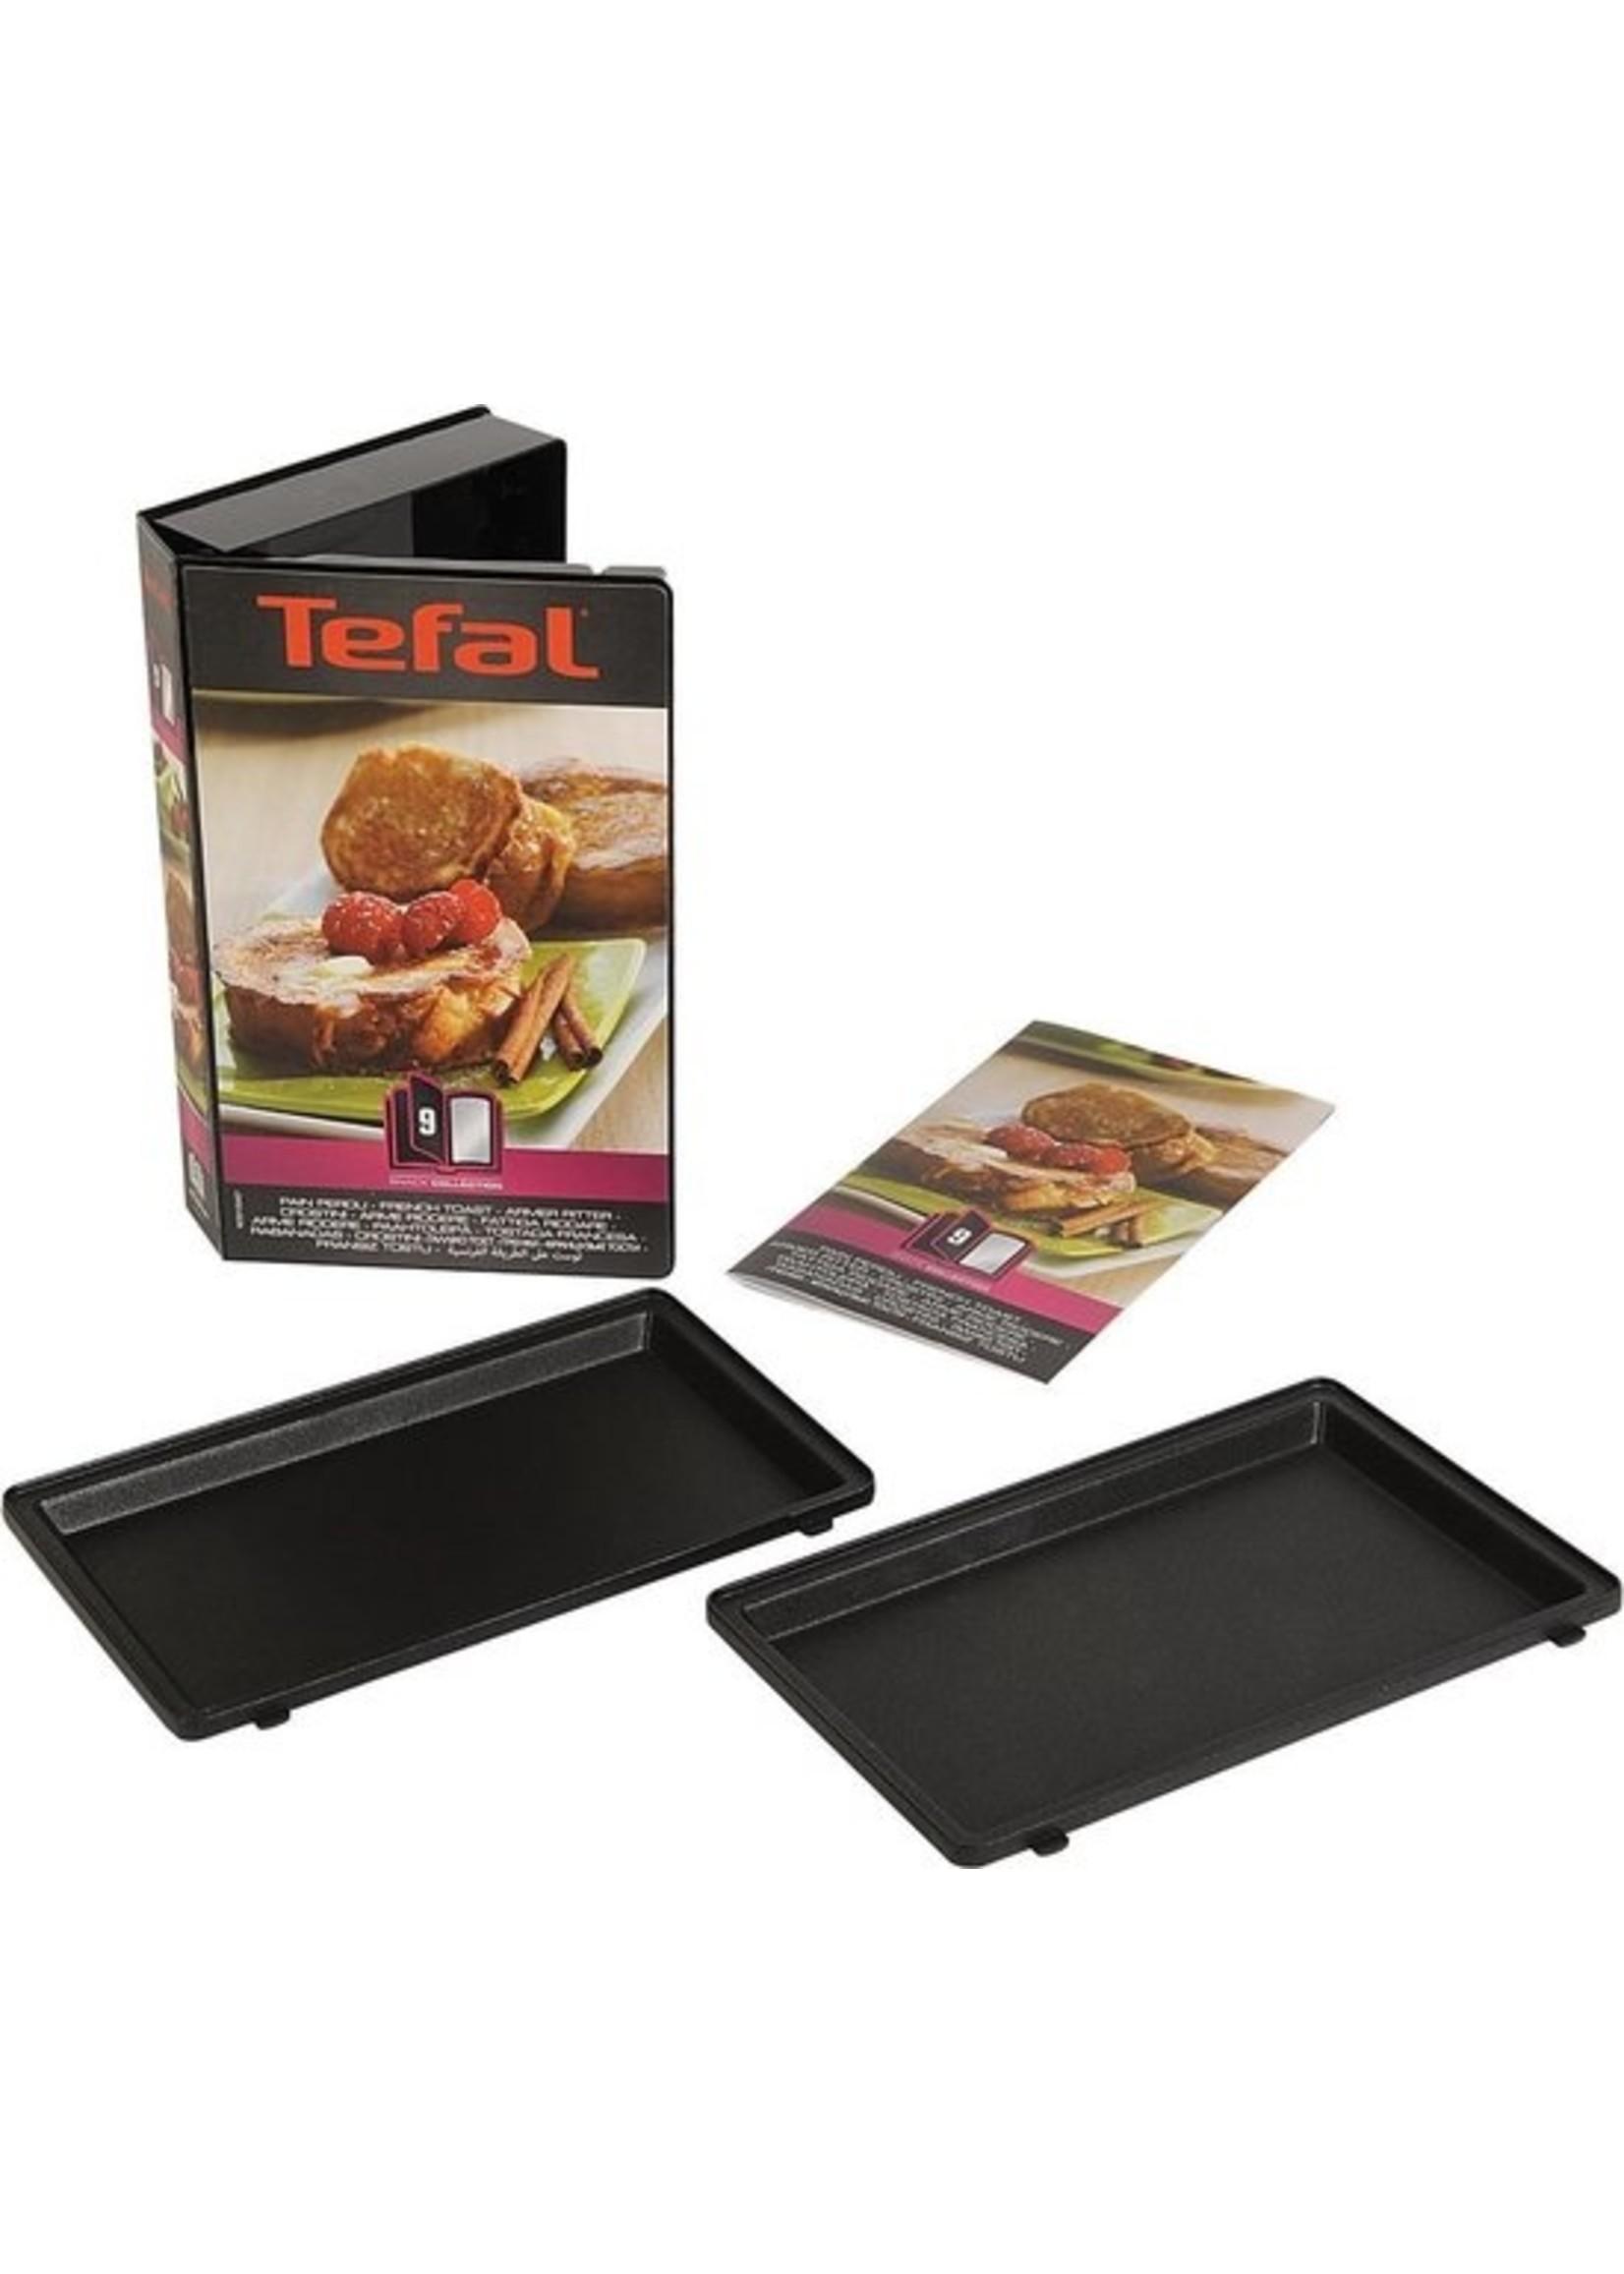 Tefal Tefal Snack Collection XA8009 - Wentelteefjes-platen